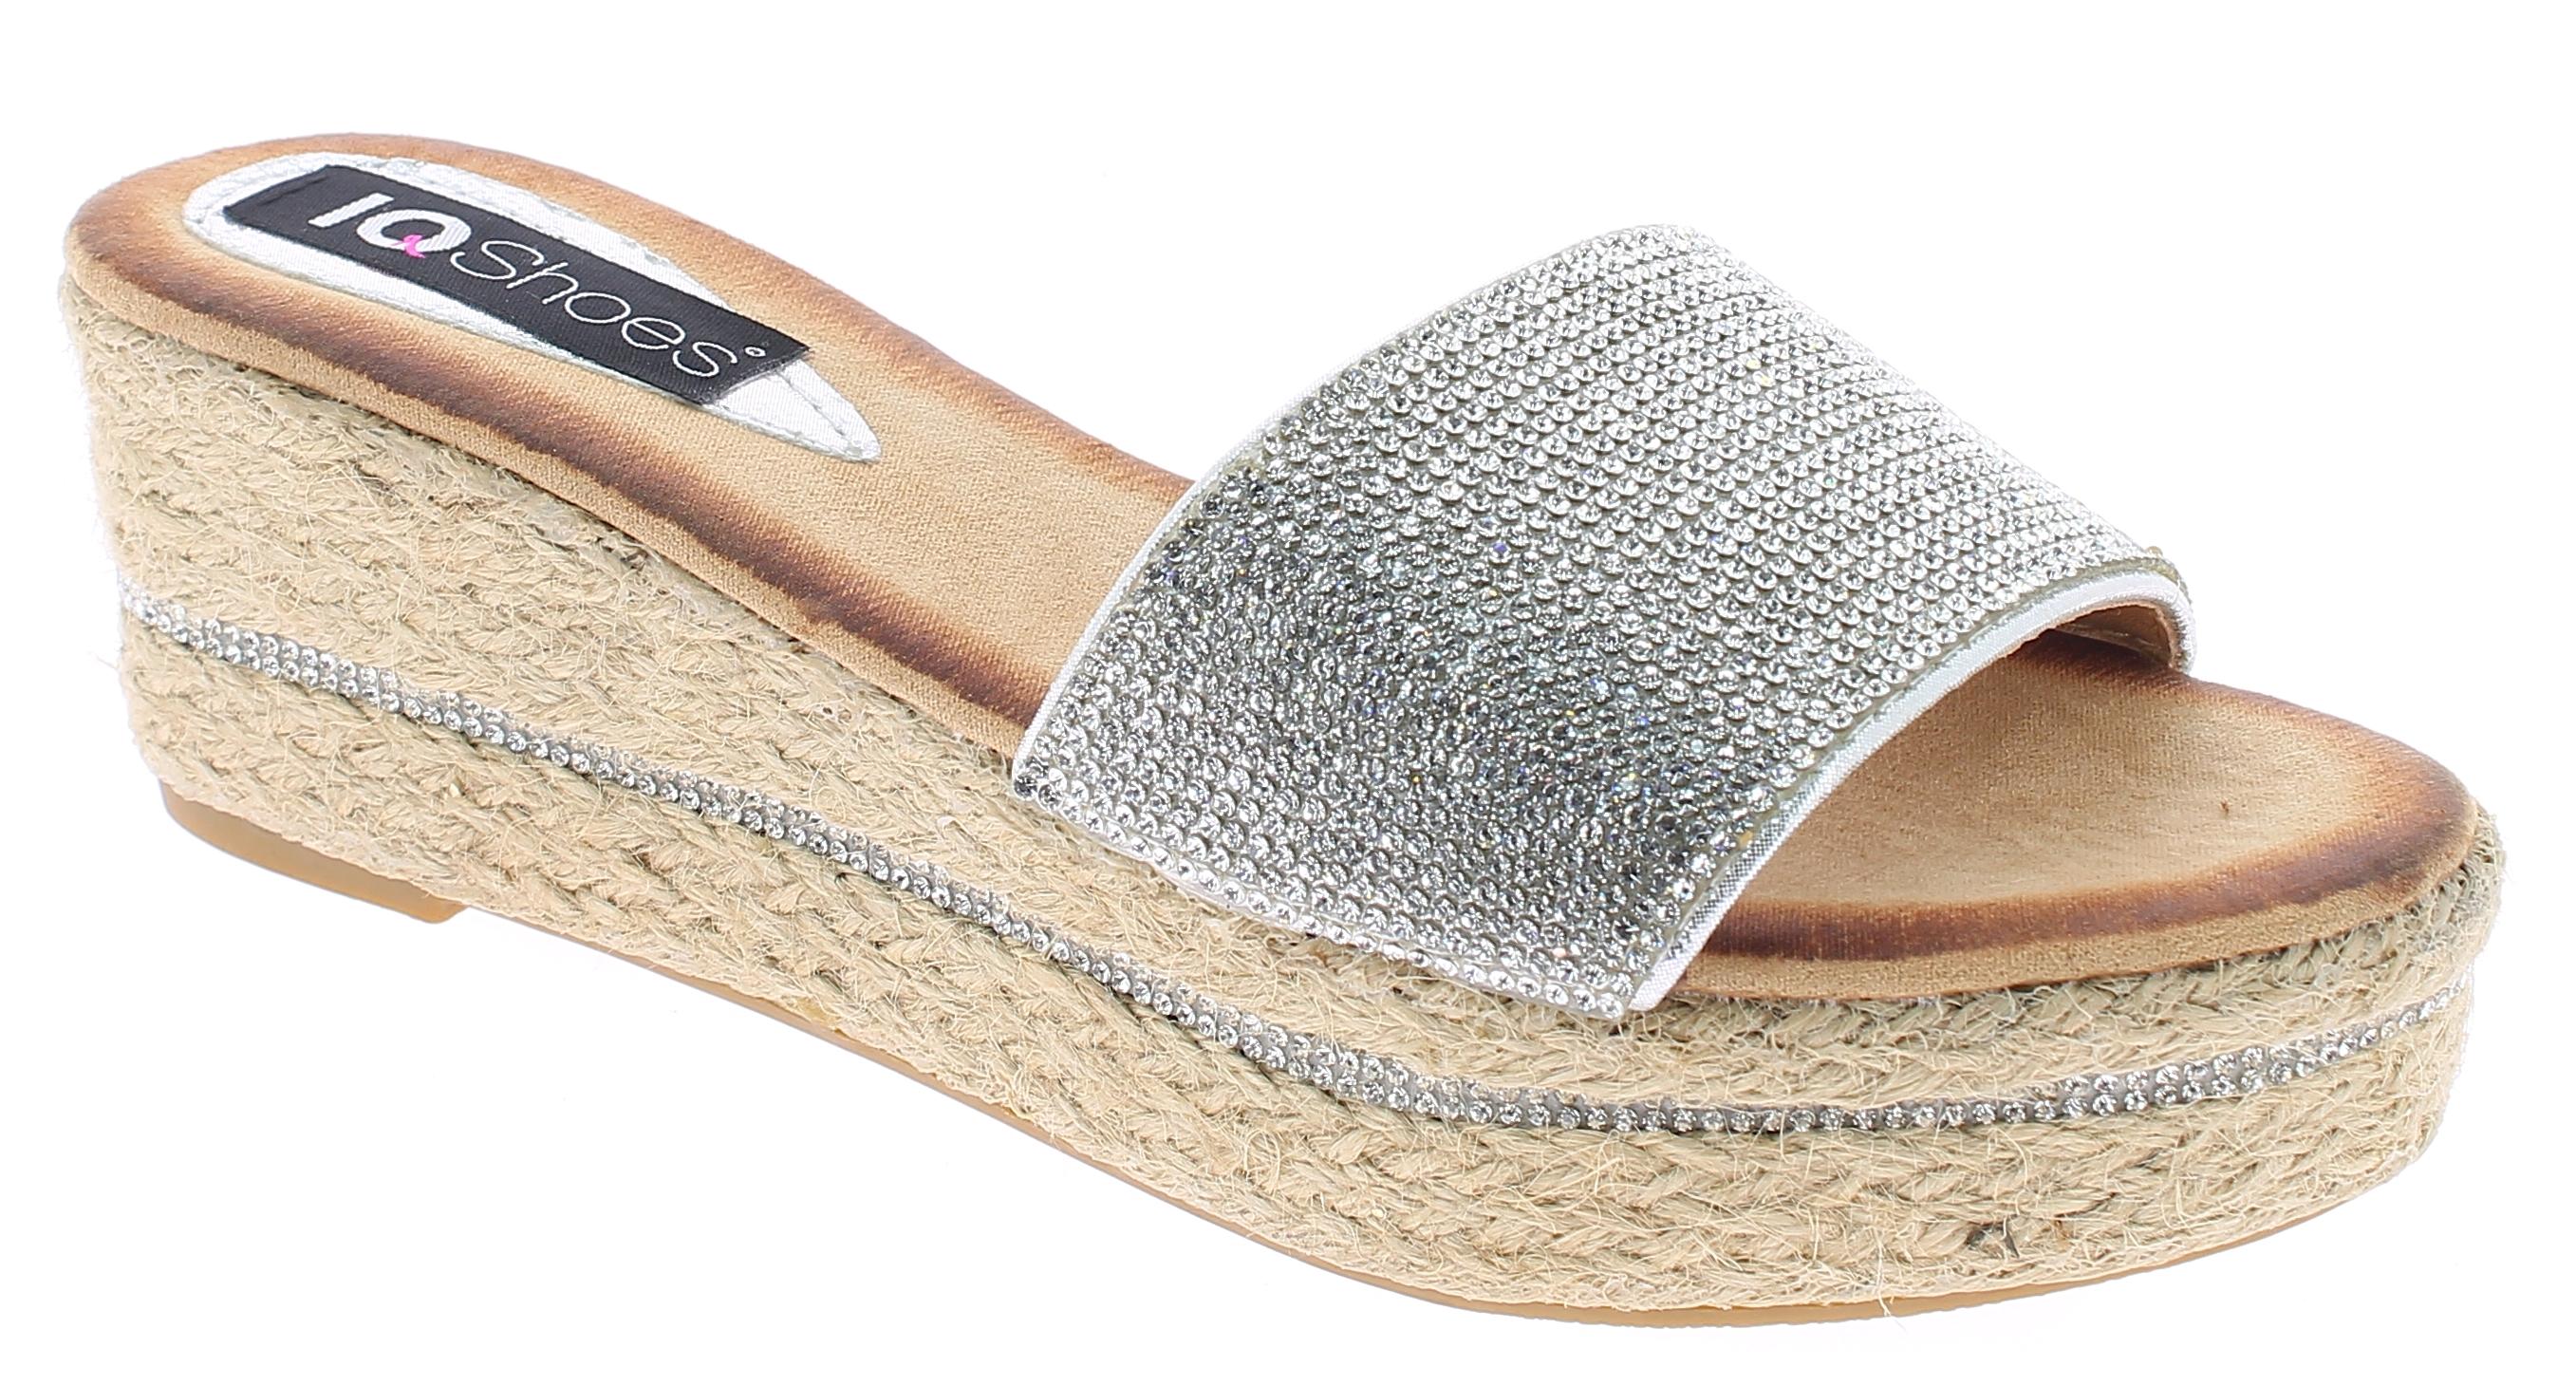 IQSHOES Γυναικεία Πλατφόρμα 1AE17171 Ασημί - IqShoes - 1AE-17171-silver-37/1/35/ παπούτσια  γυναικείες πλατφόρμες